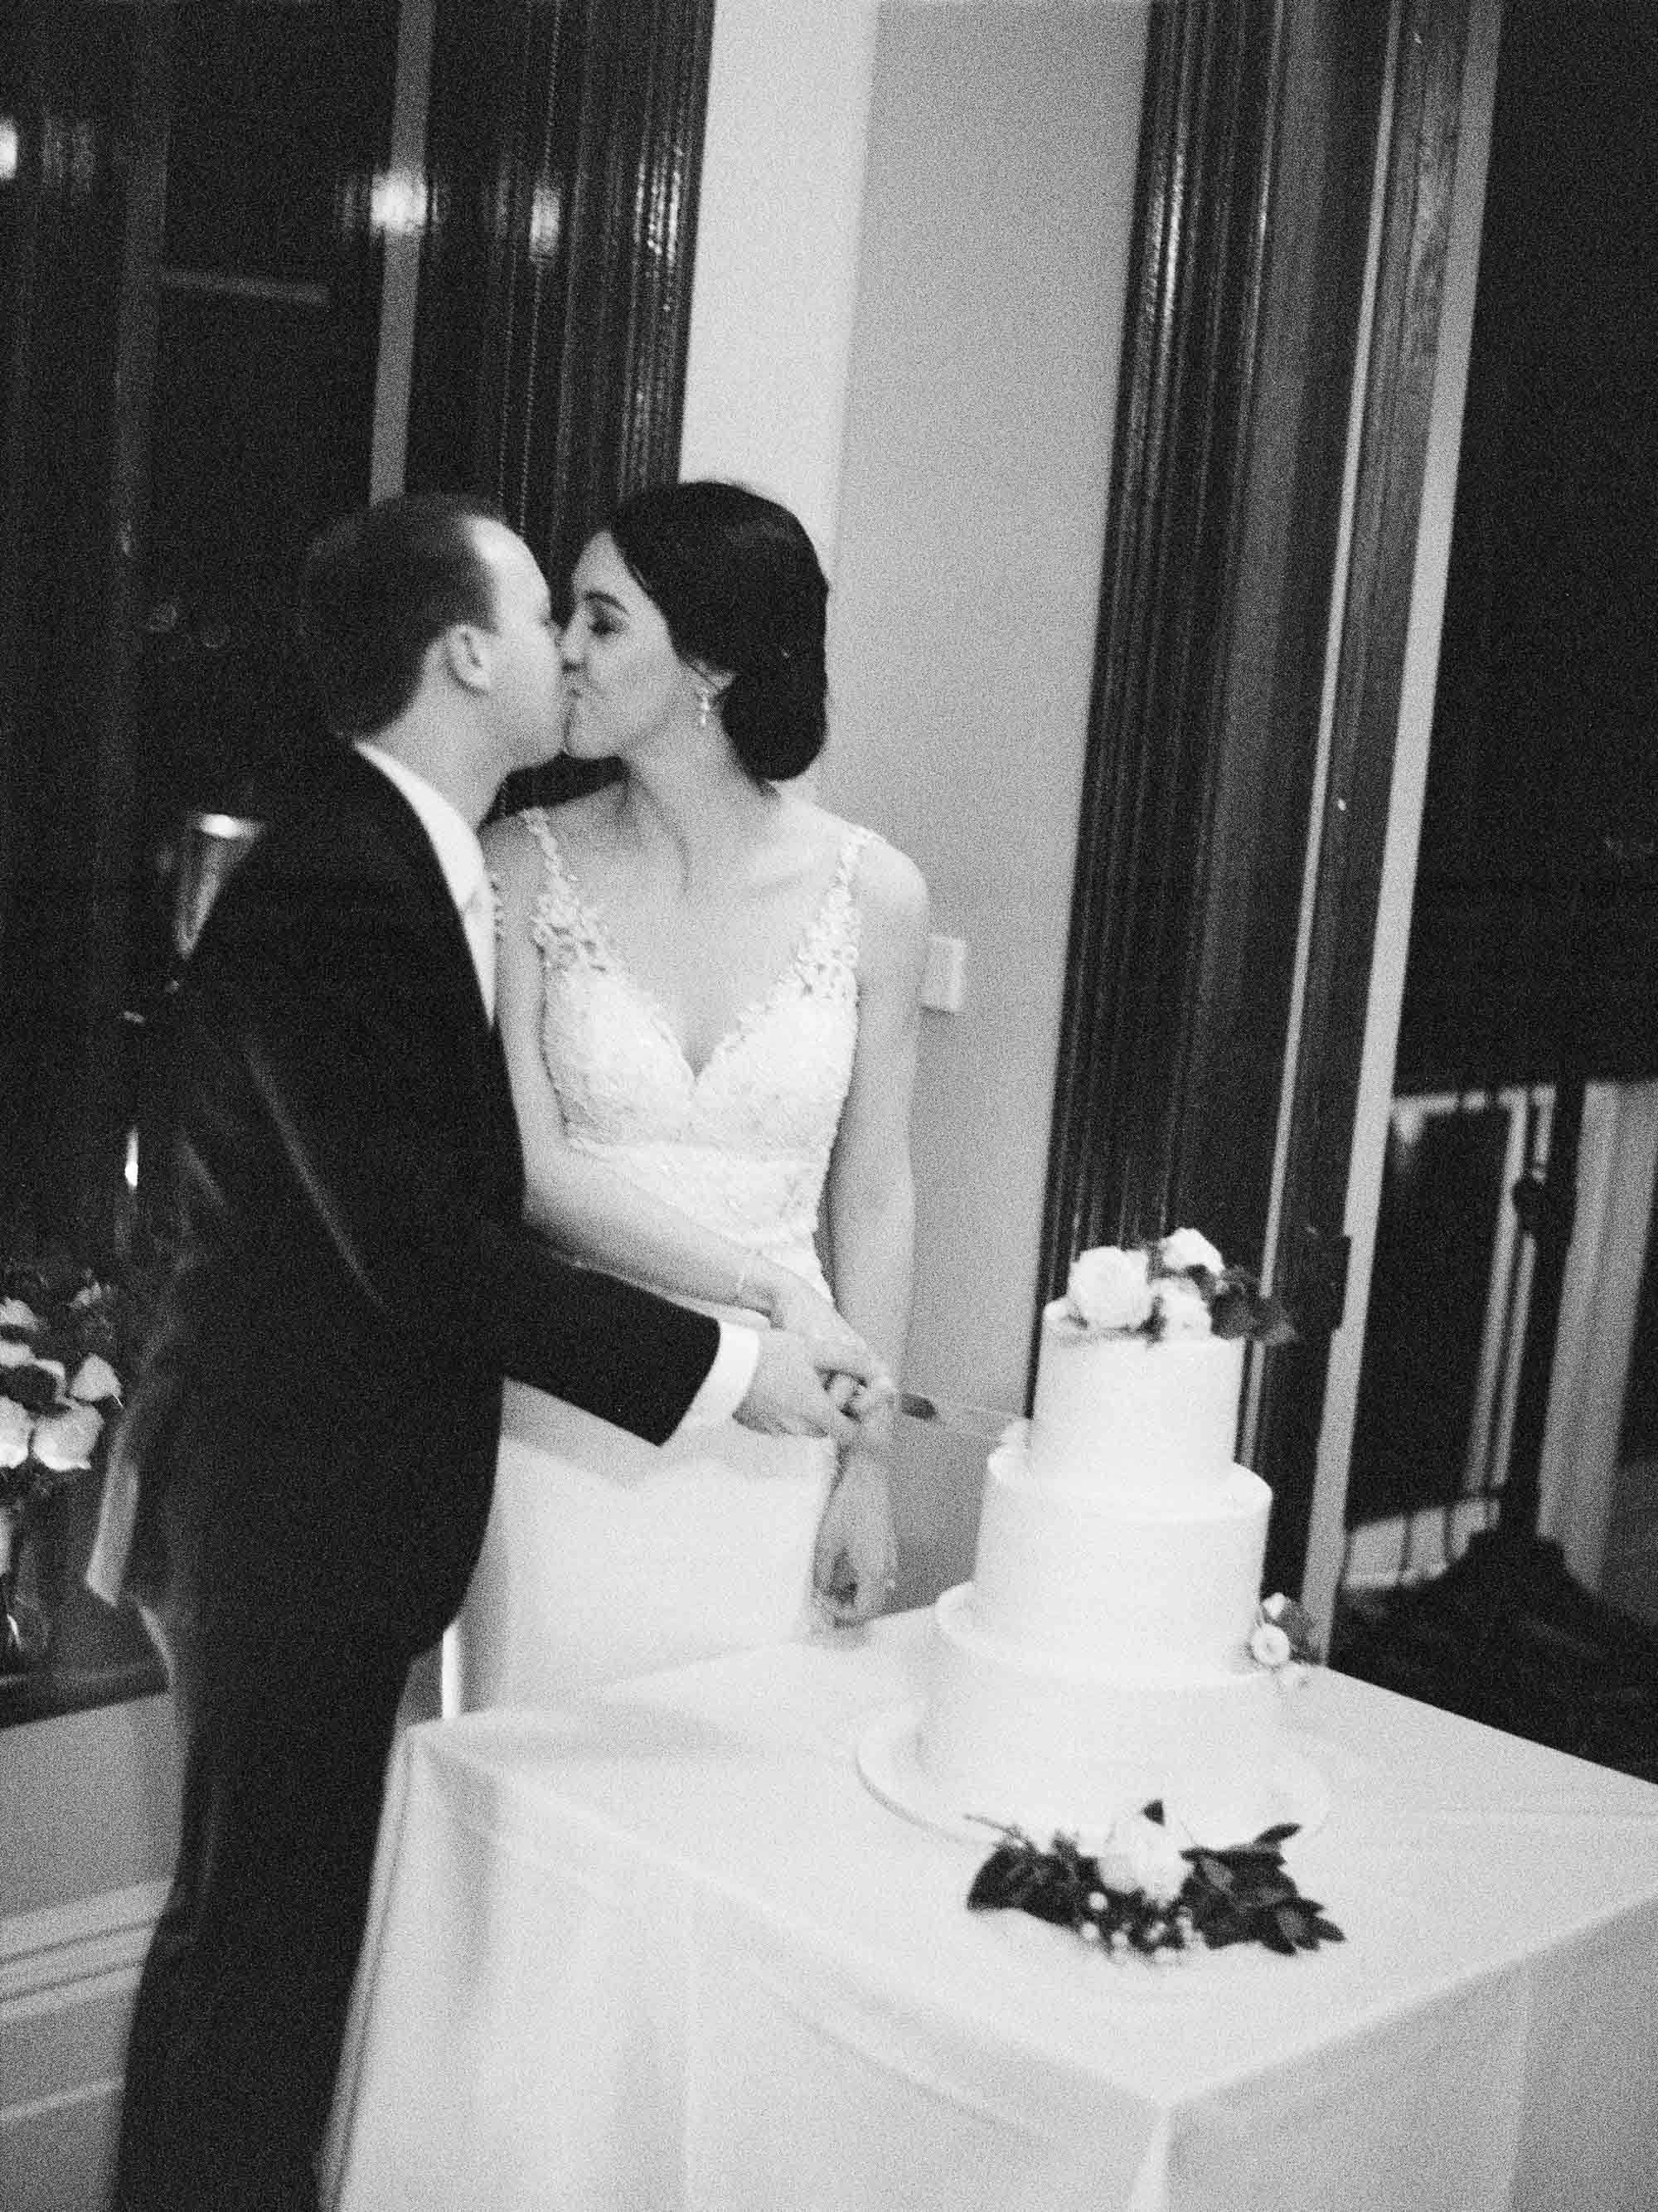 Mount-Lofty-House-wedding-photography-099.jpg